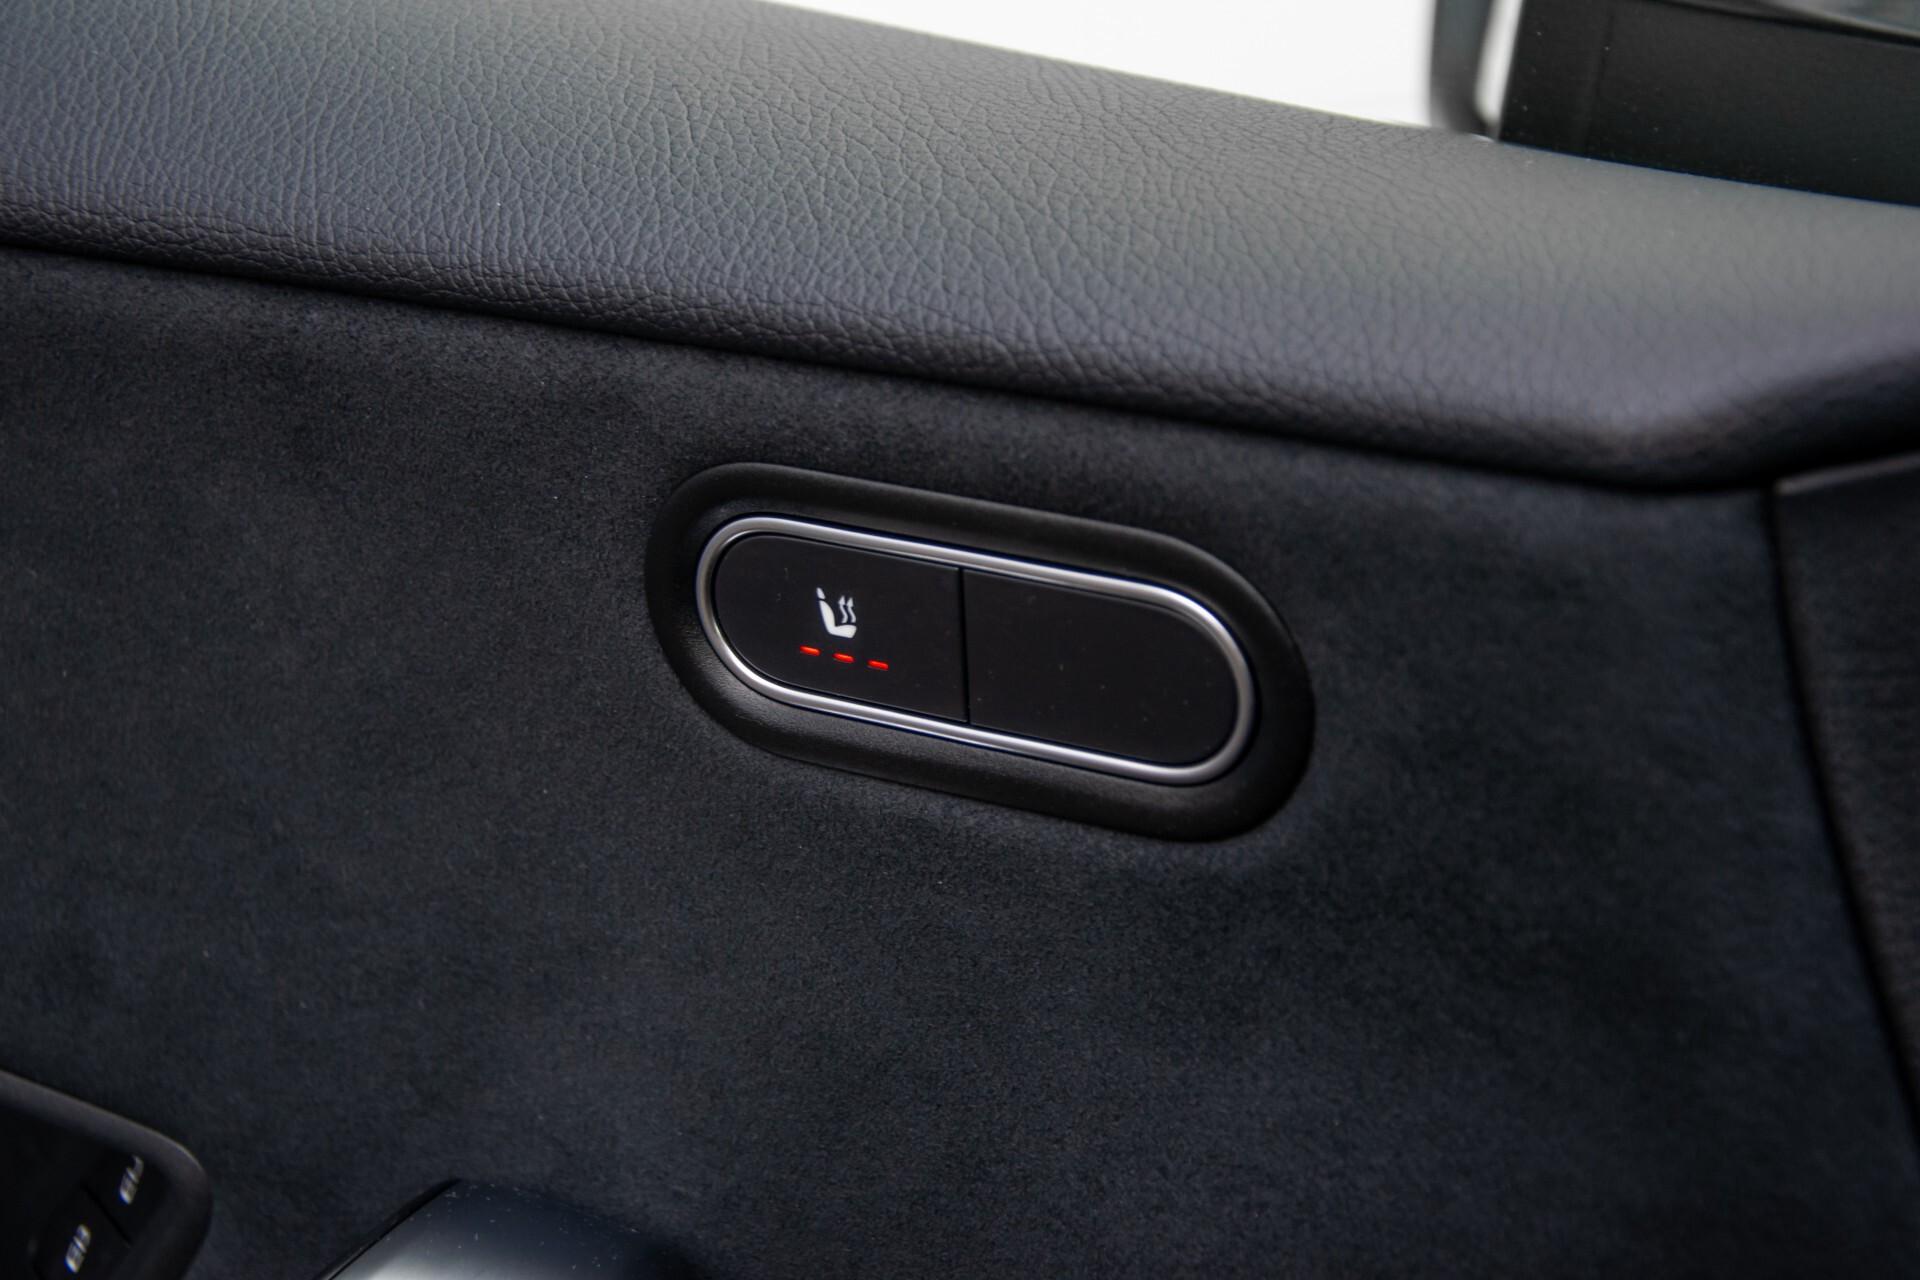 Mercedes-Benz A-Klasse 250 4-M AMG Panorama/Keyless-Entry/MBUX/HUD/Burmester/360/Multibeam LED Aut7 Foto 40